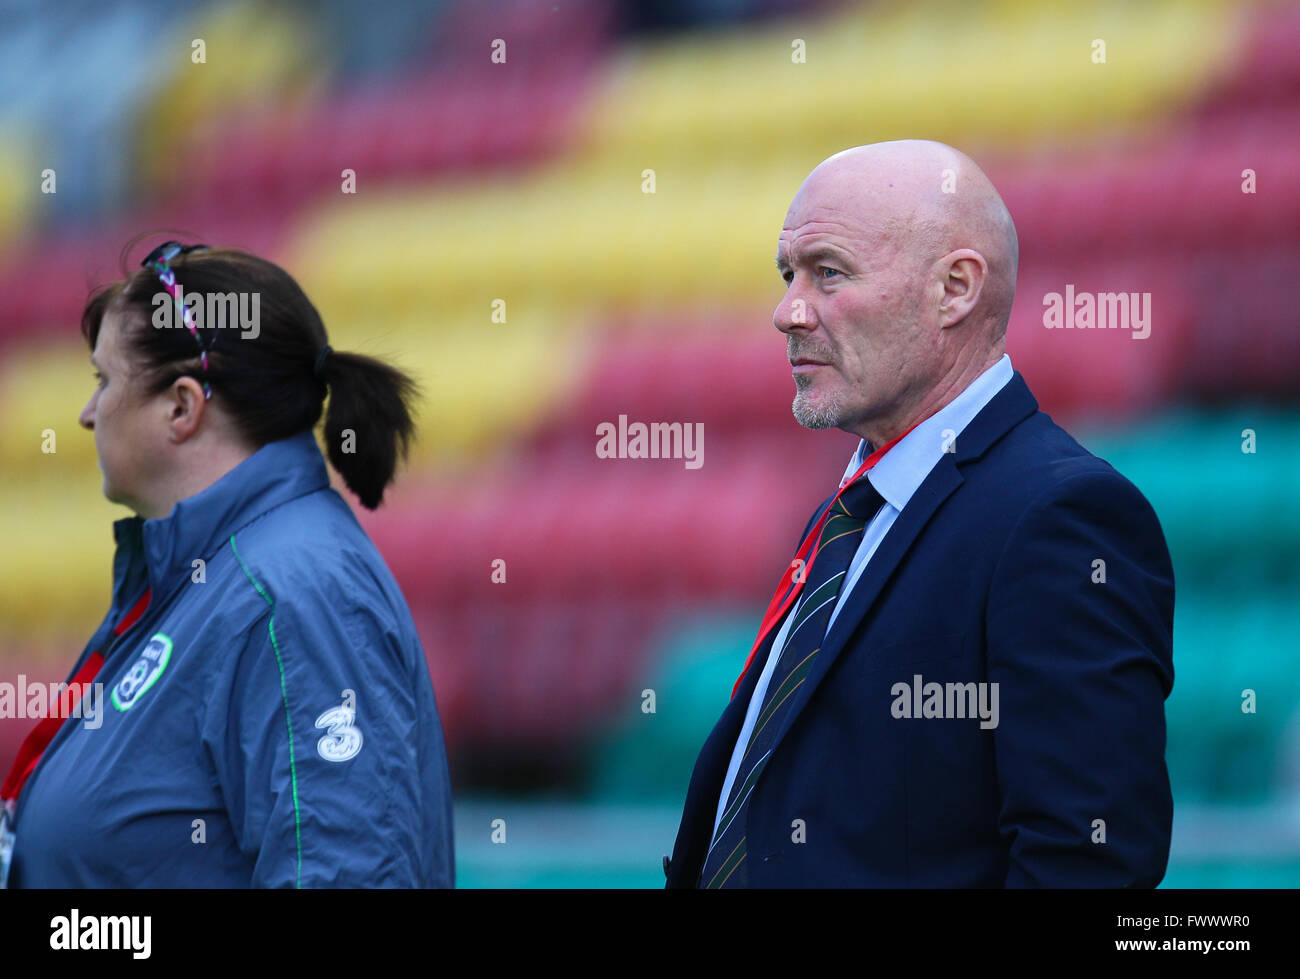 Dublin, Ireland. 7th April, 2016. Dave Connell Ireland U19 Coach, Ireland Women U19 v Azerbaijan Women U19, UEFA - Stock Image